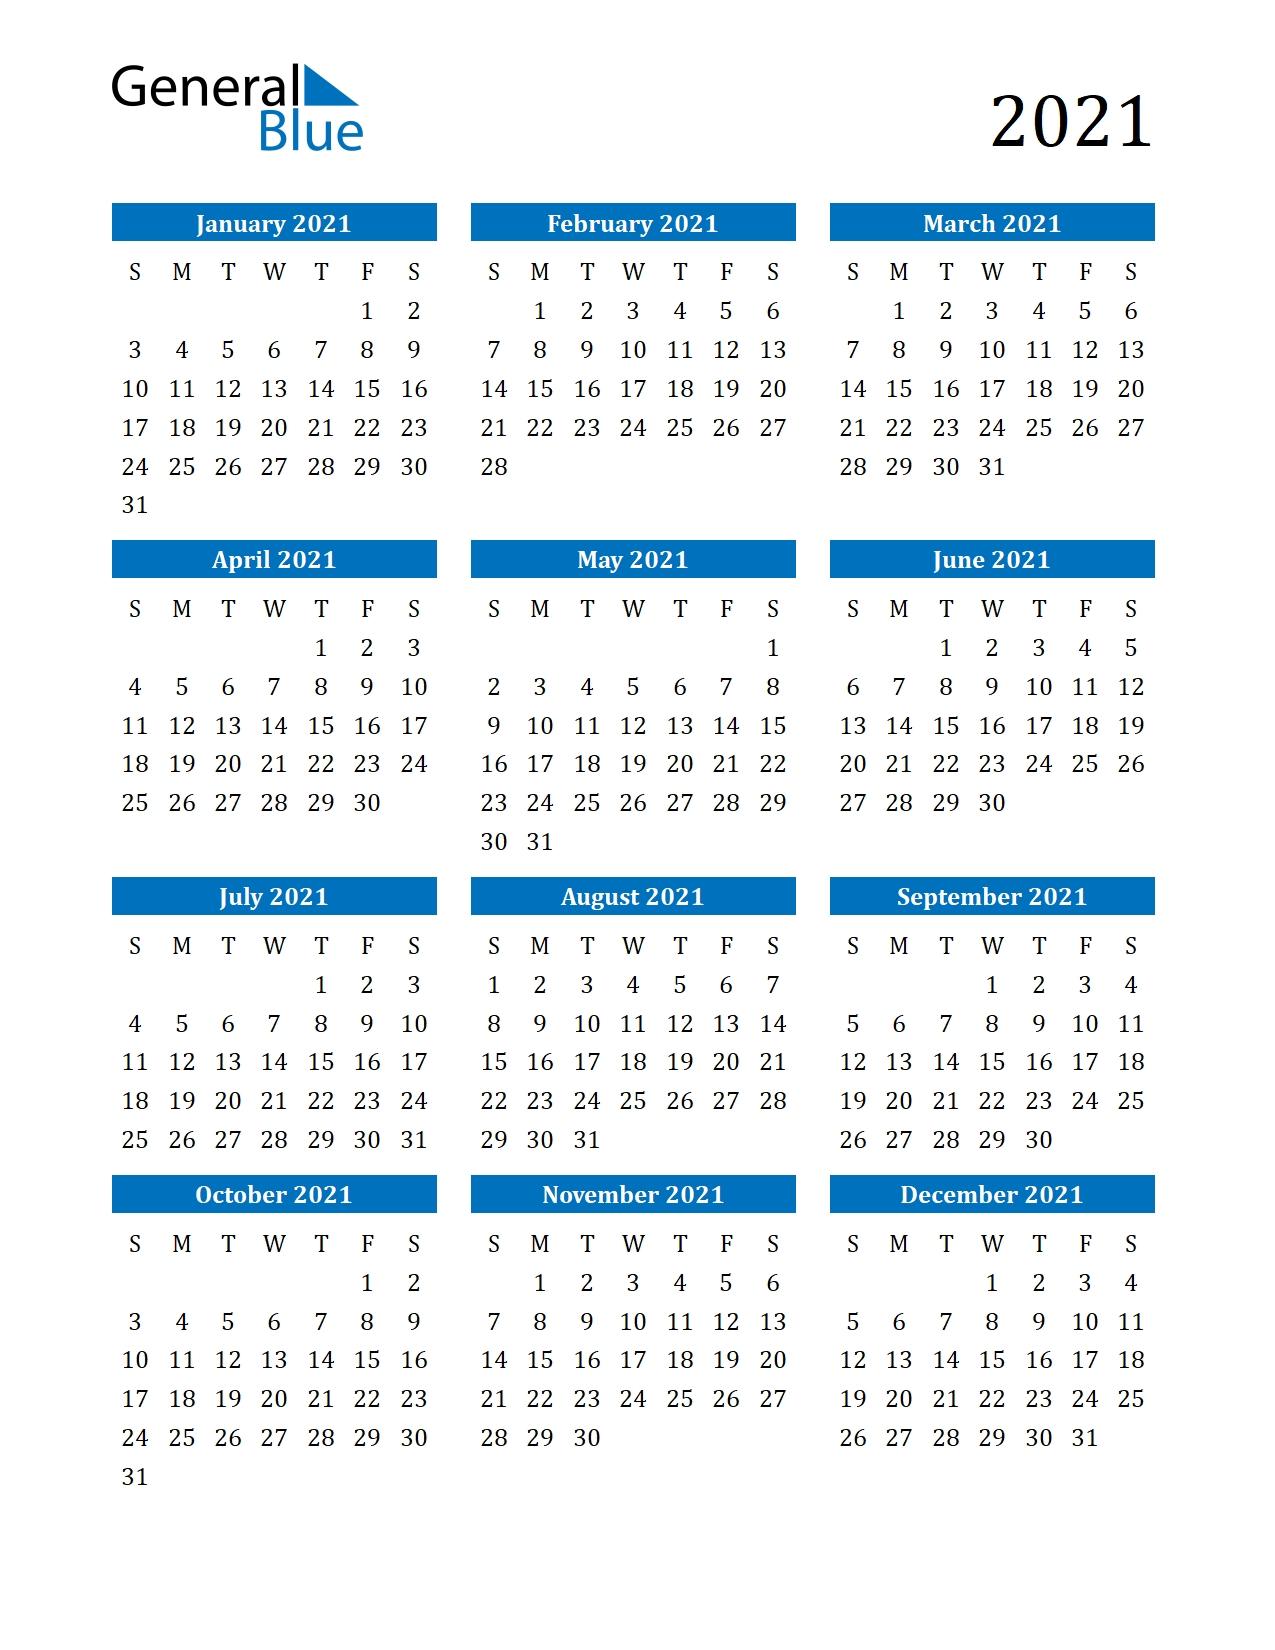 Get August 2021 Calendar Thru Dec 2021 Free